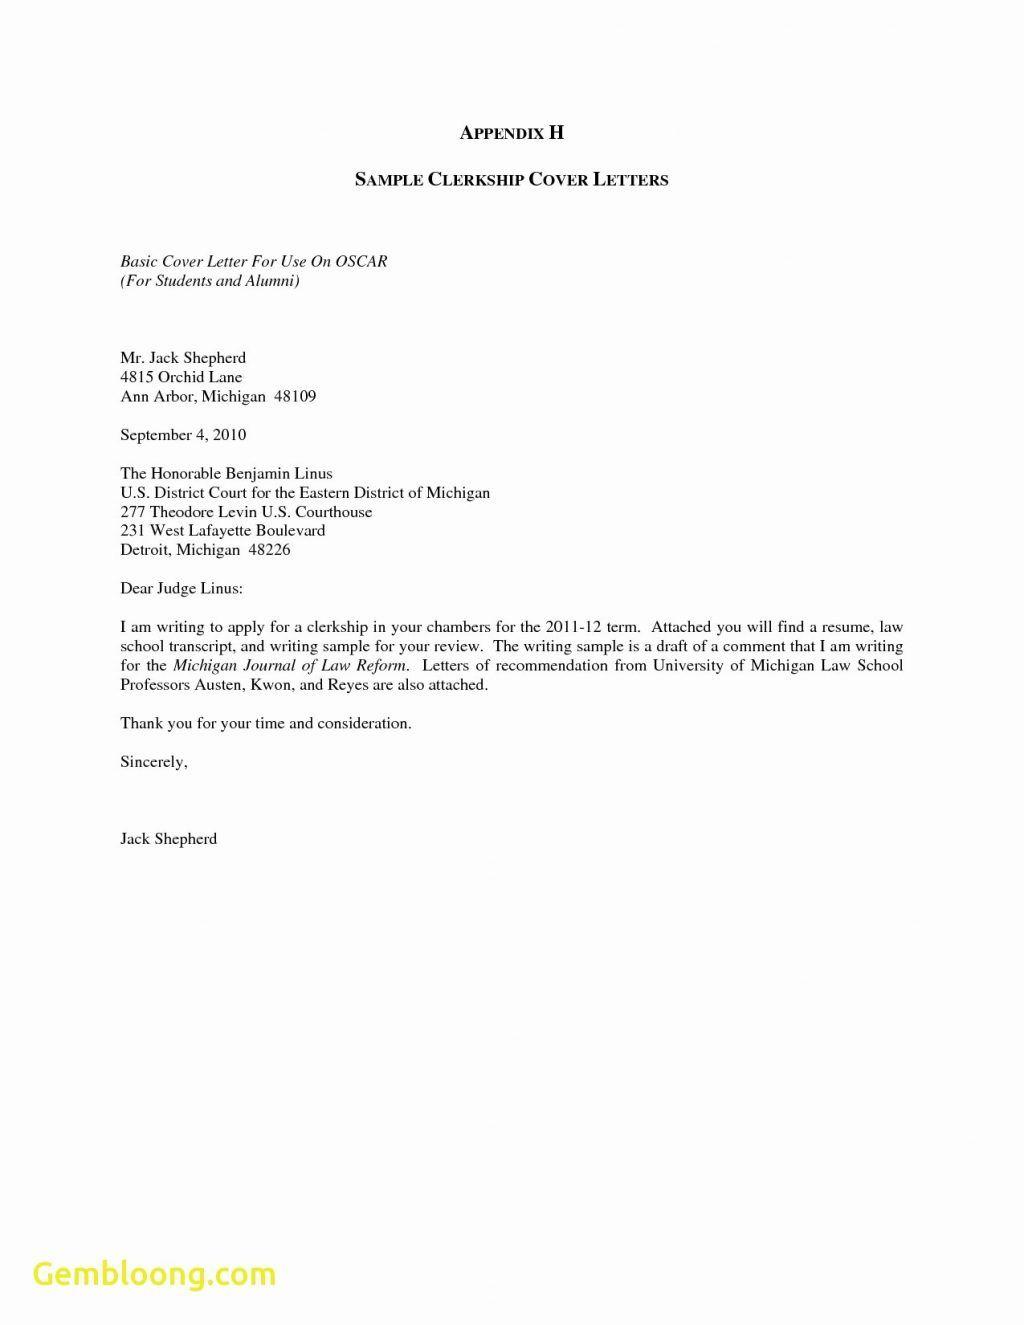 25 General Cover Letter Cover Letter For Resume Basic Cover